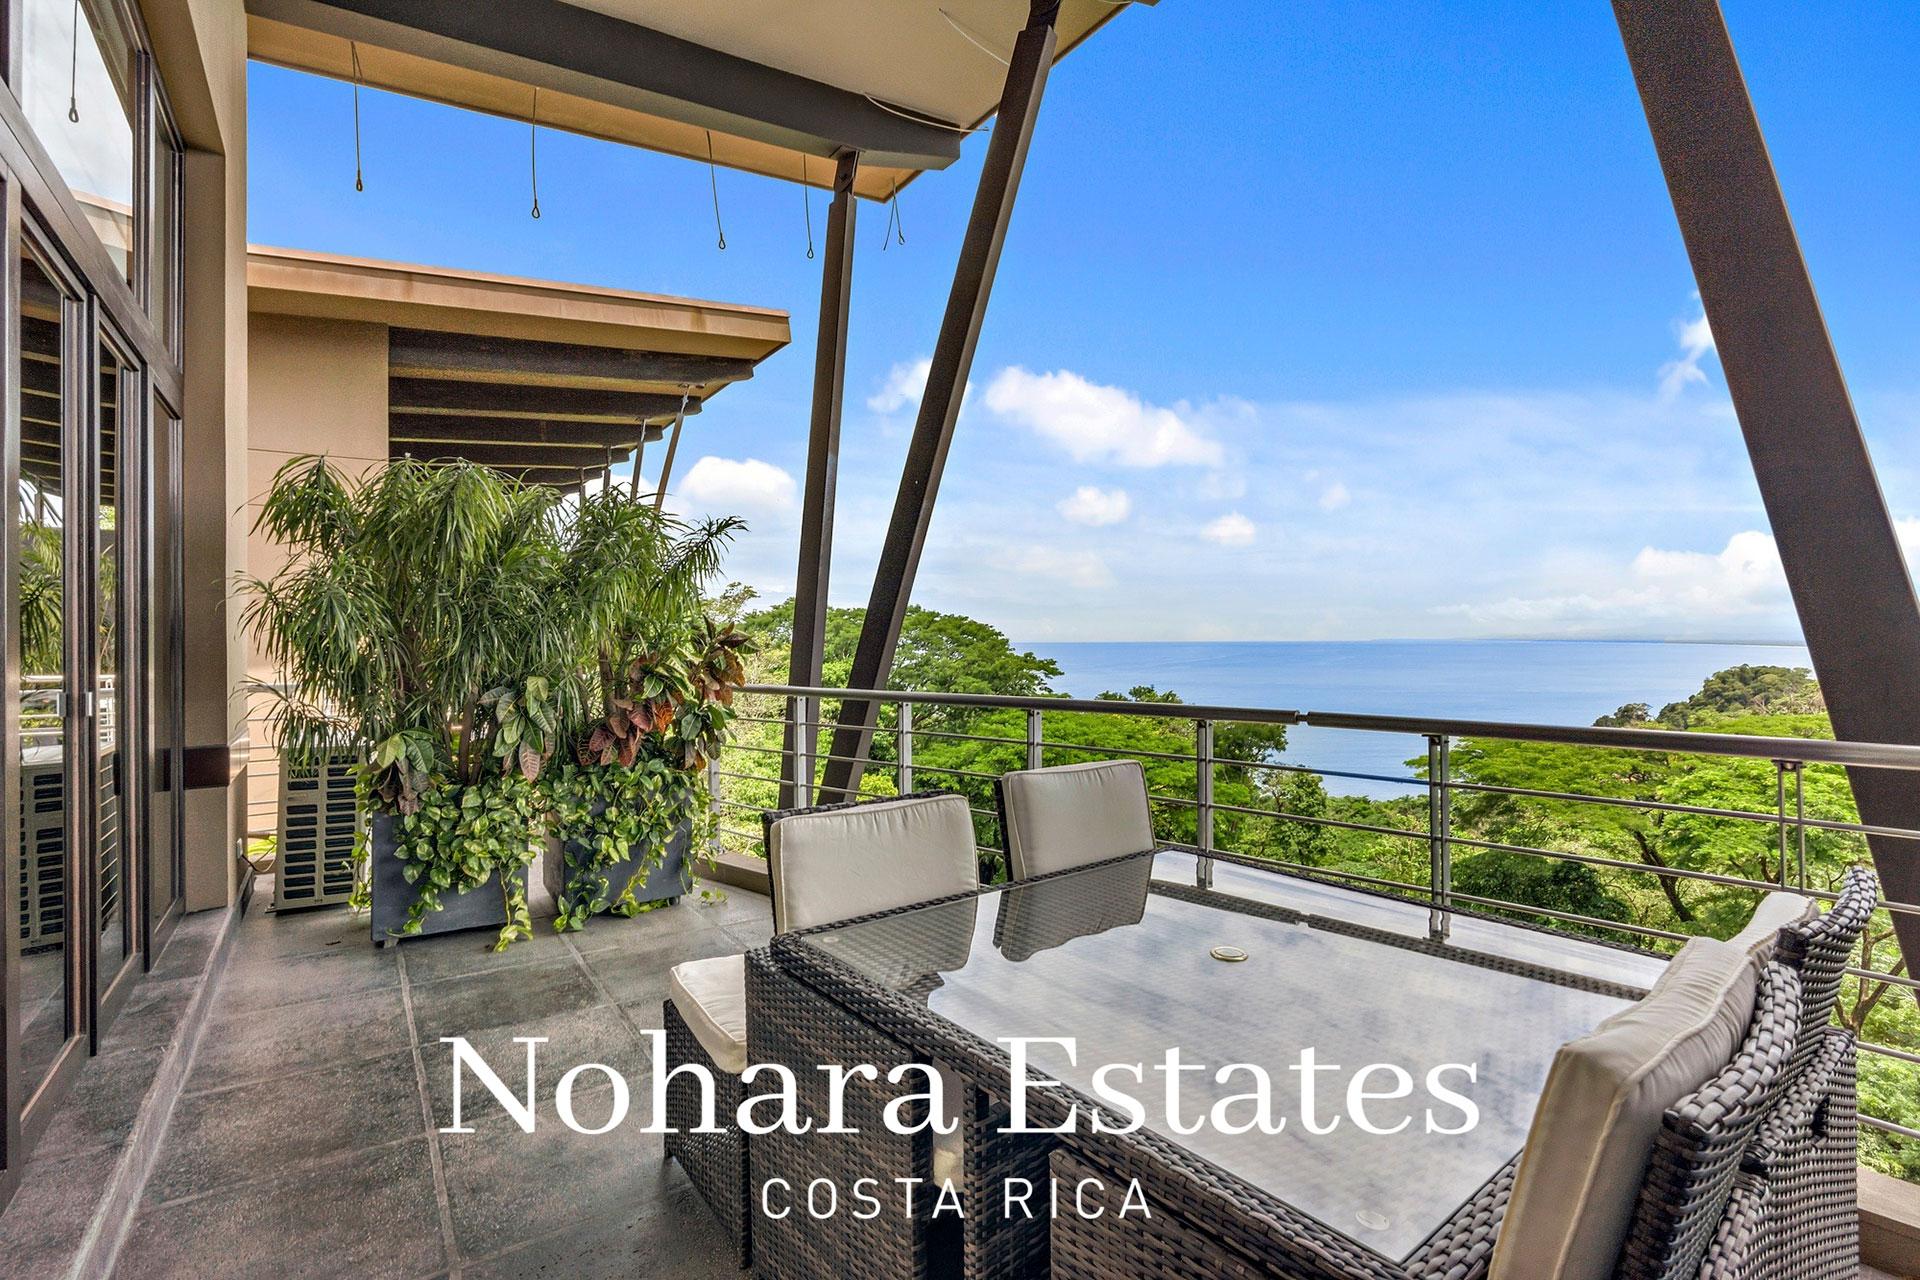 Nohara Estates Costa Rica 128 Penthouse Quepos Los Altos 4